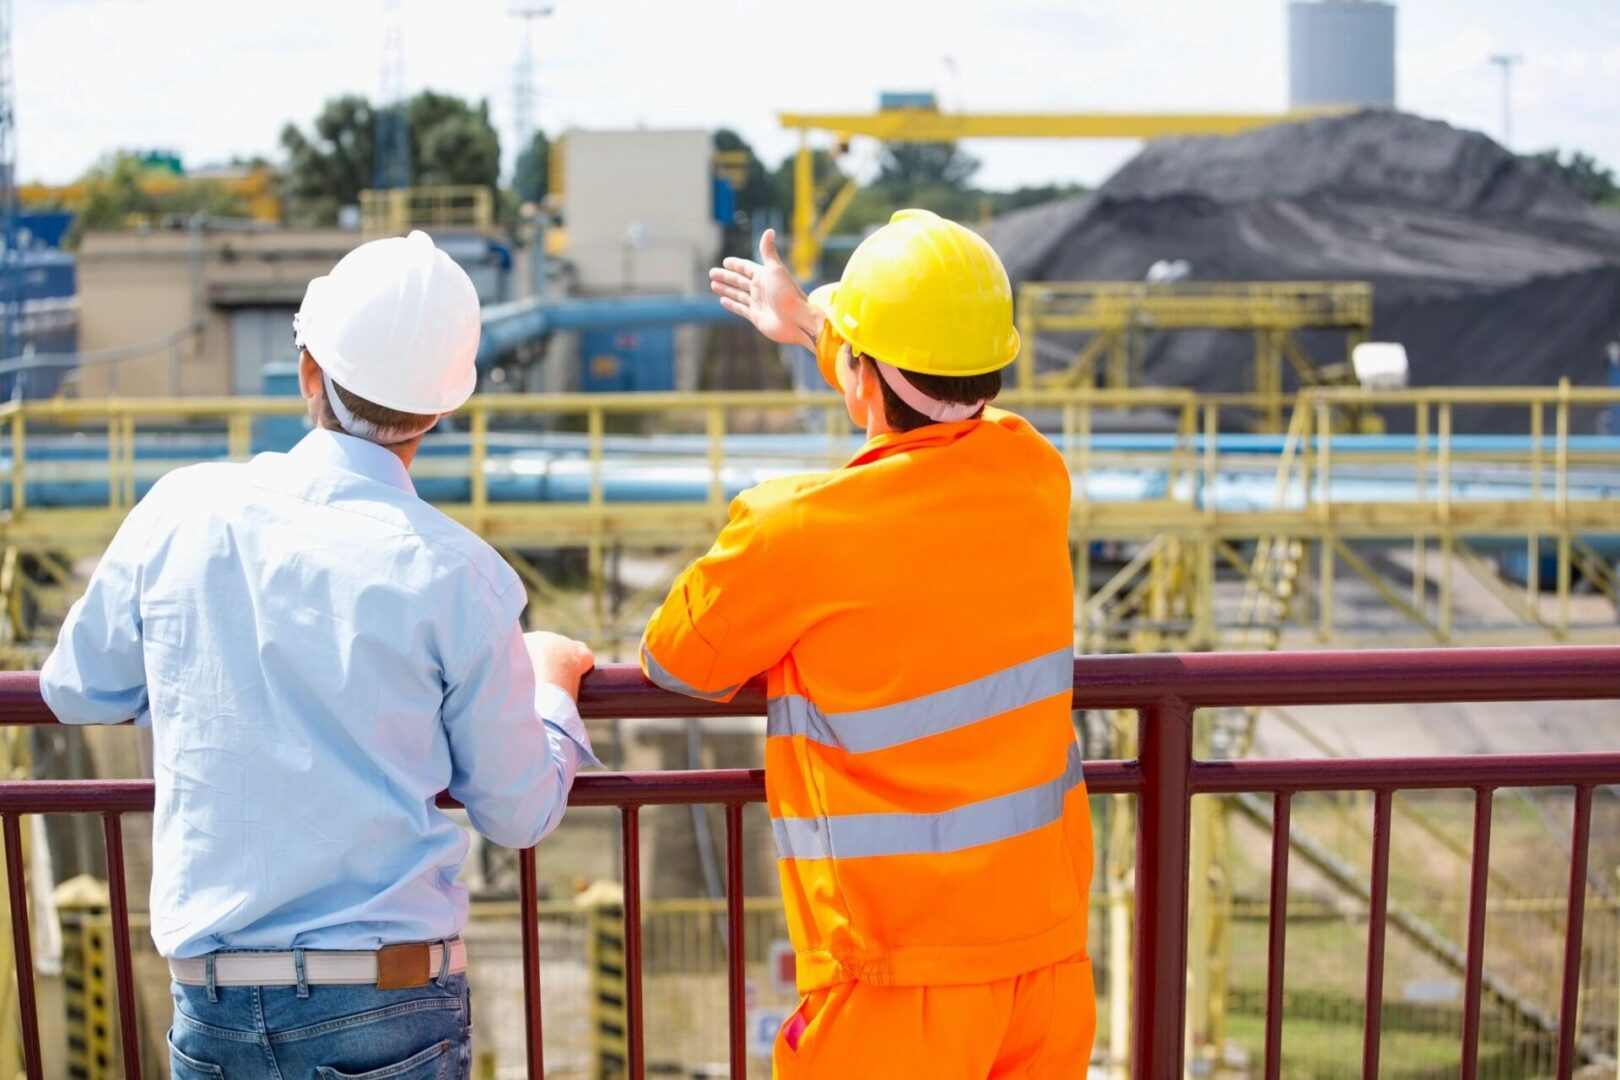 Construction workers implementing construction management practices near Washington, DC